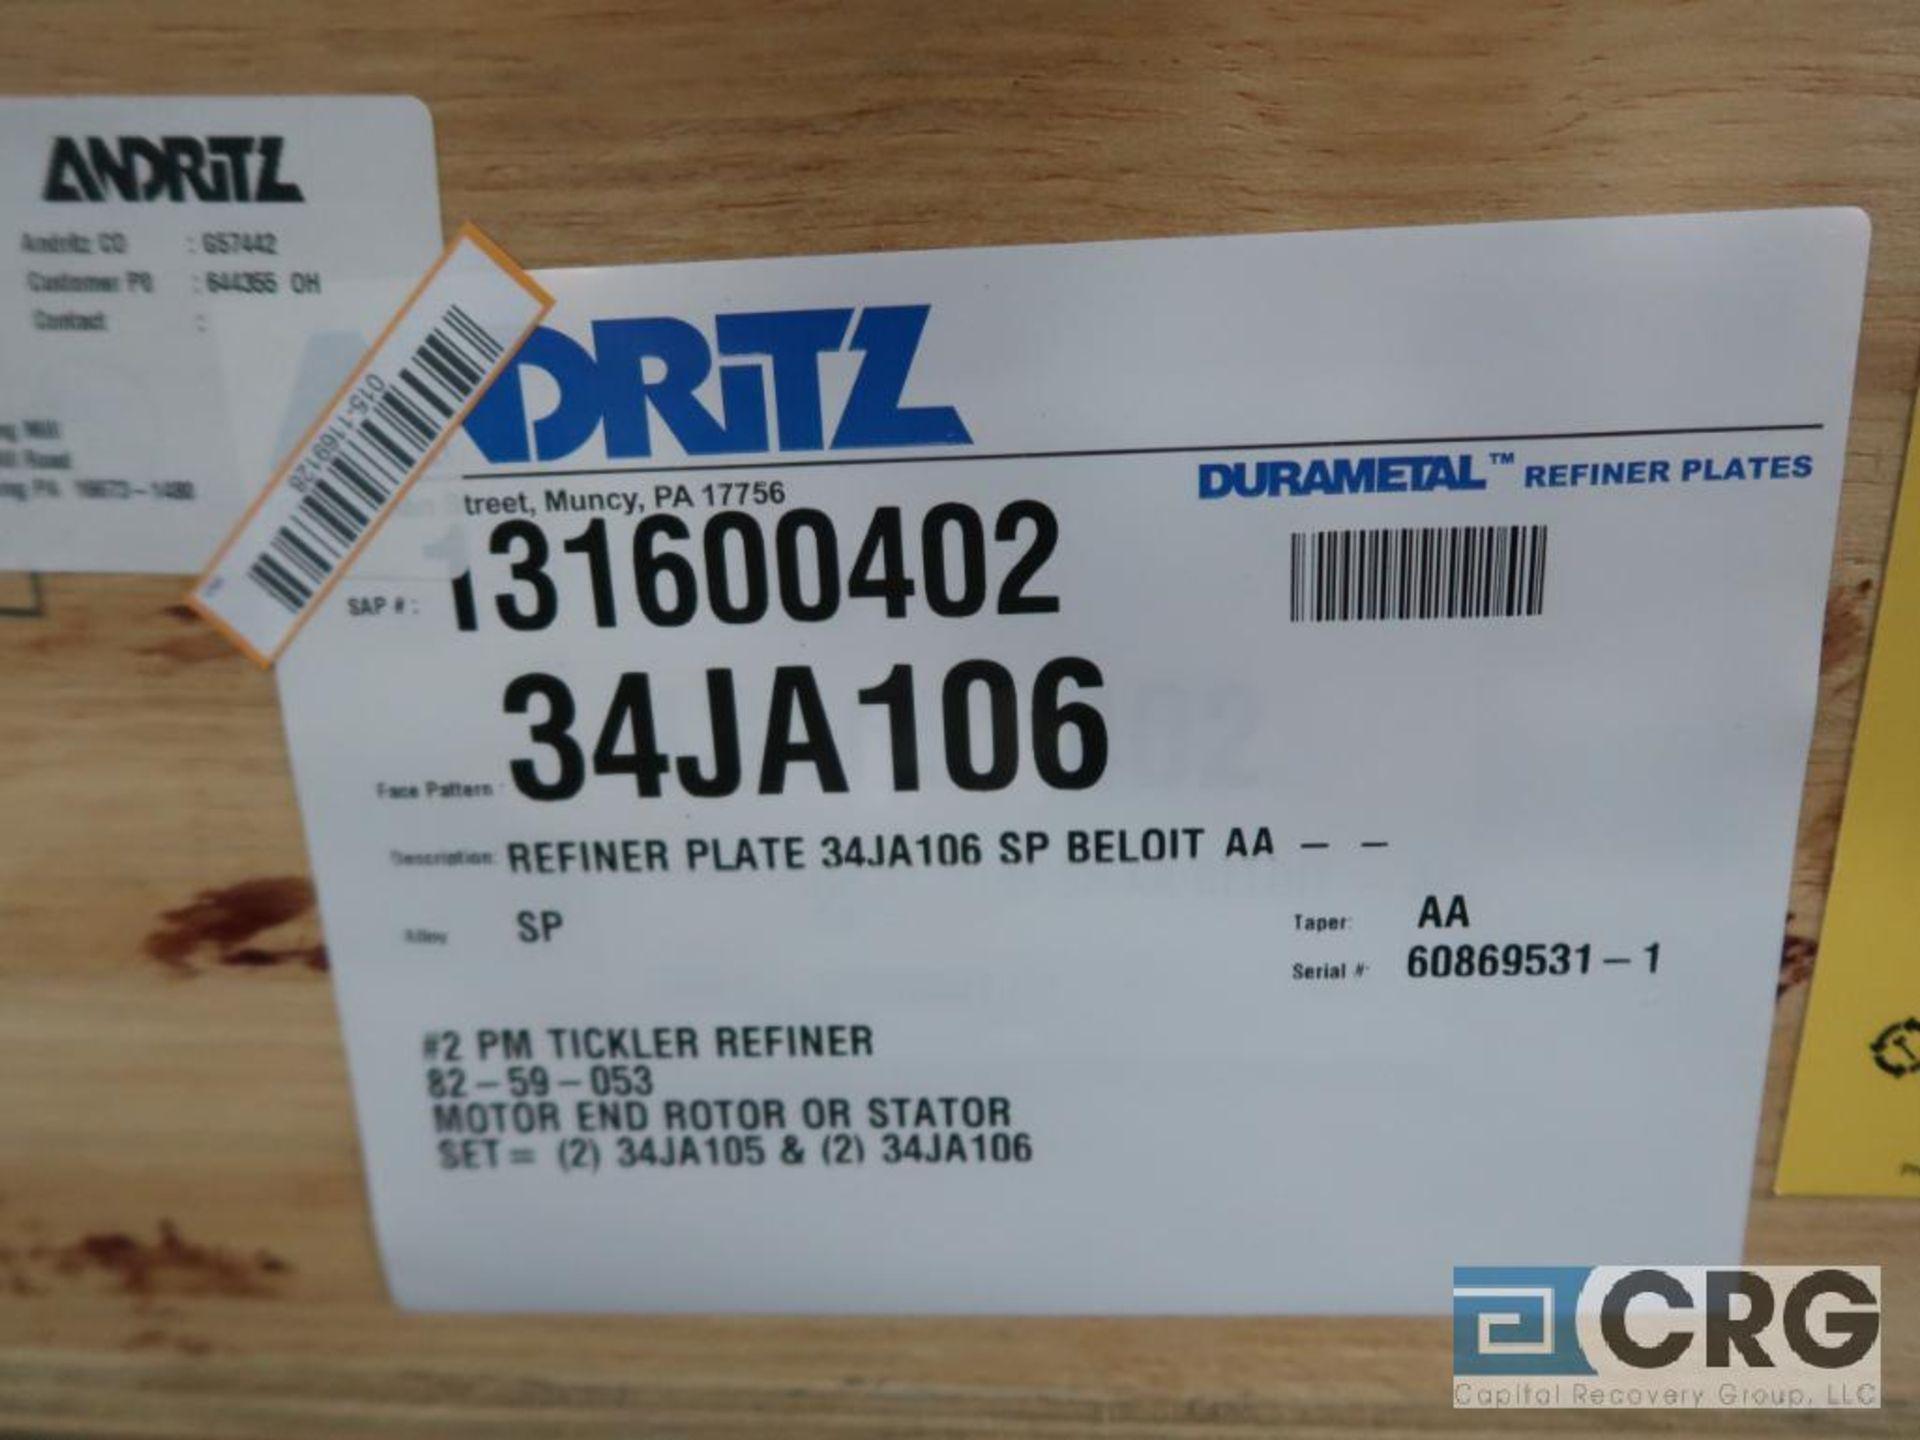 Lot of (4) Andritz 34JA106 refiner plates (Finish Building) - Image 2 of 2